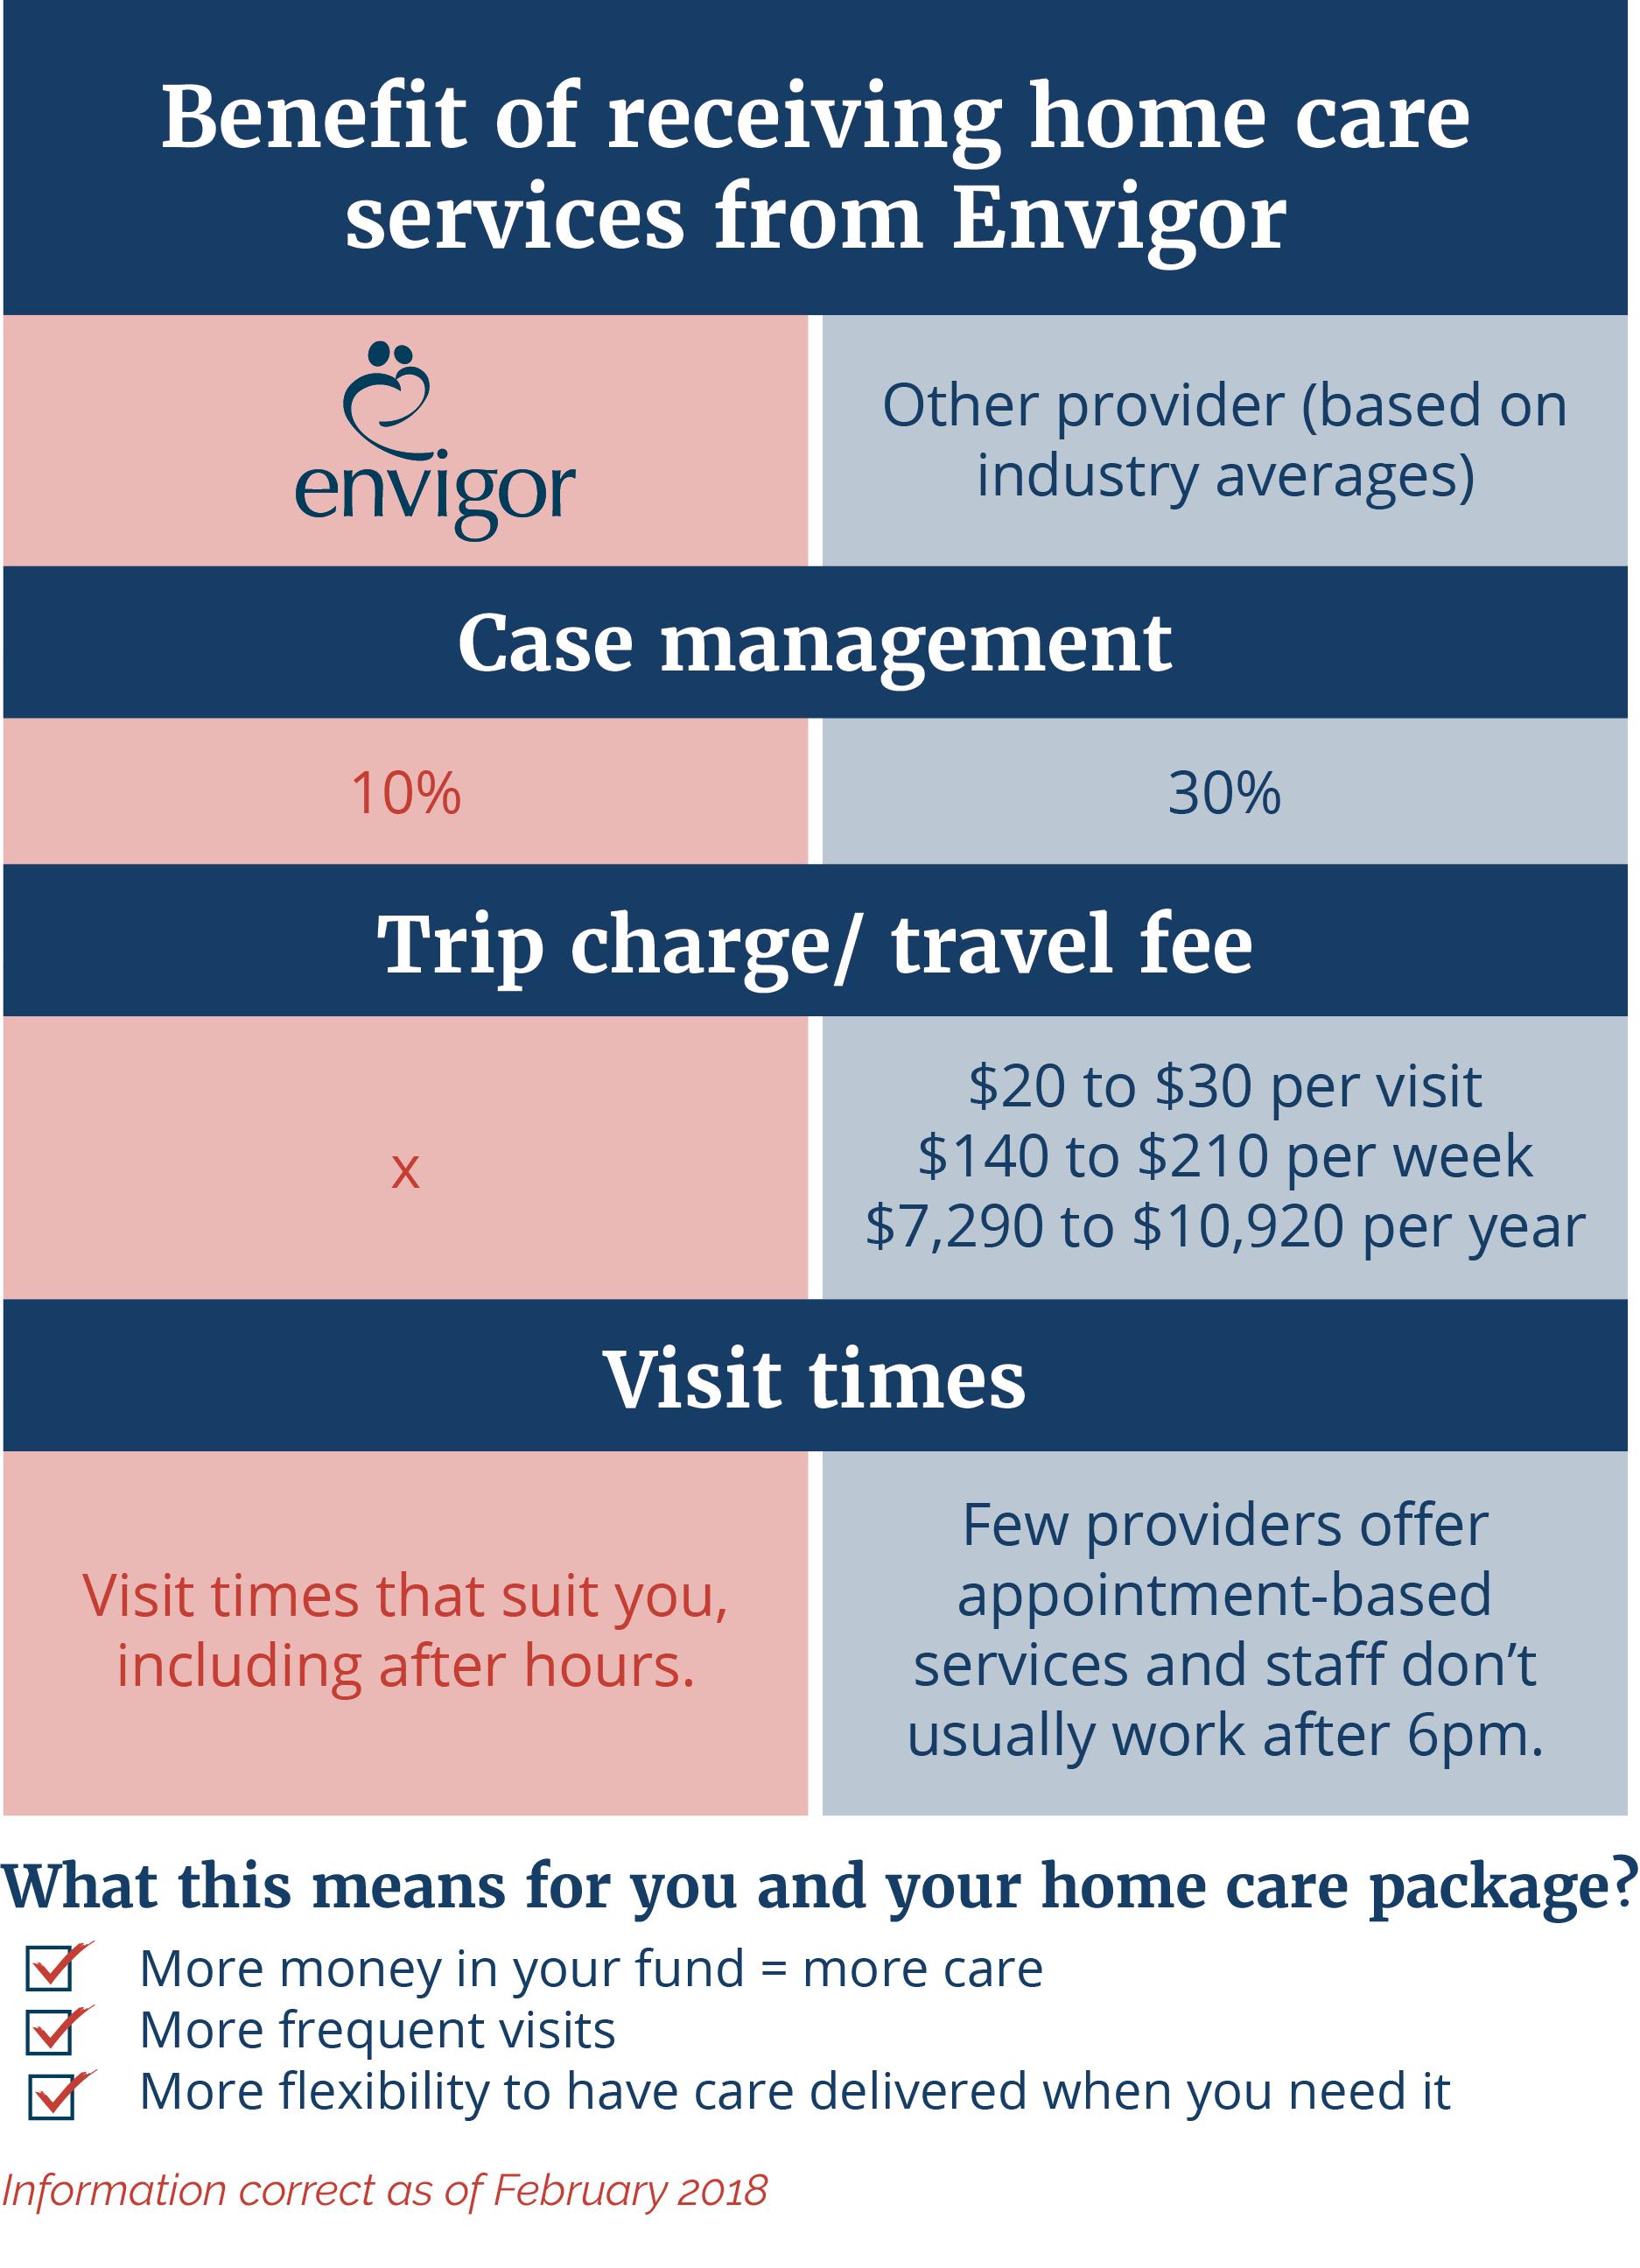 Receiving care services from Envigor